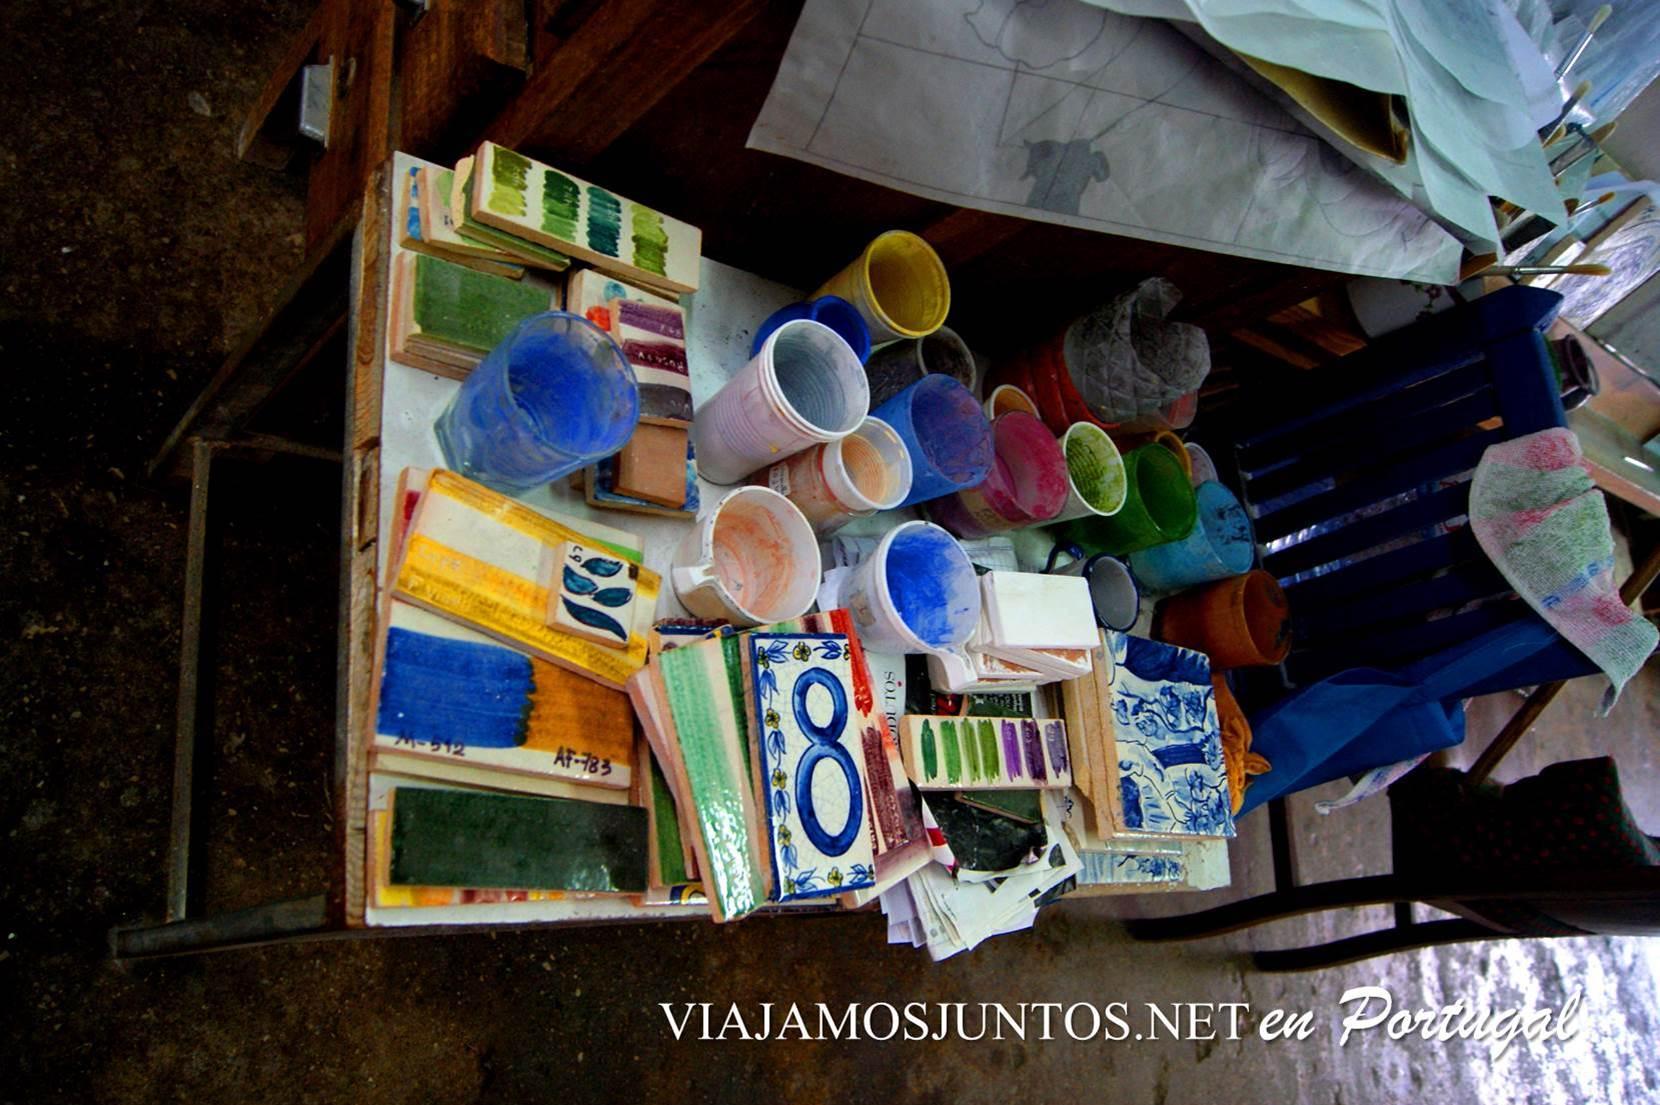 Colores en el taller de azulejos Sao Simao en Azeitao, Setúbal, Portugal